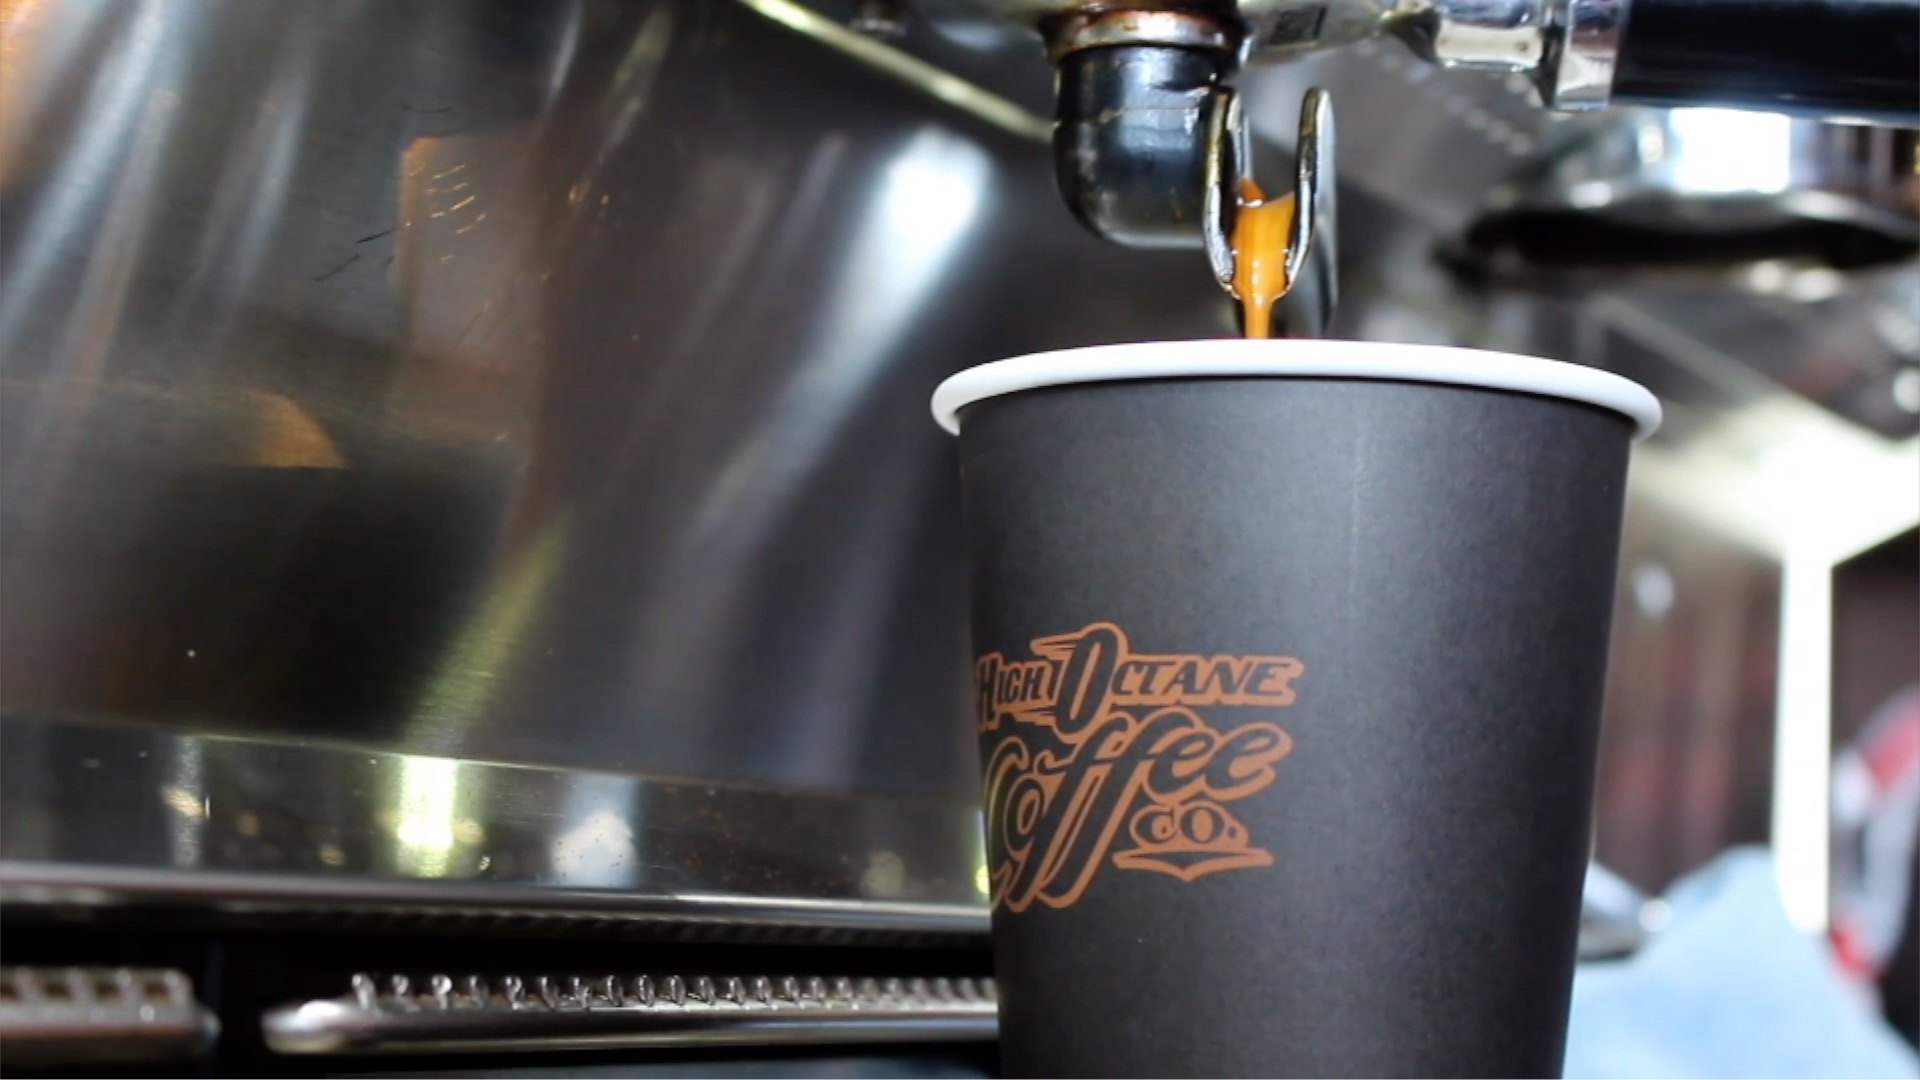 High Octane Coffee